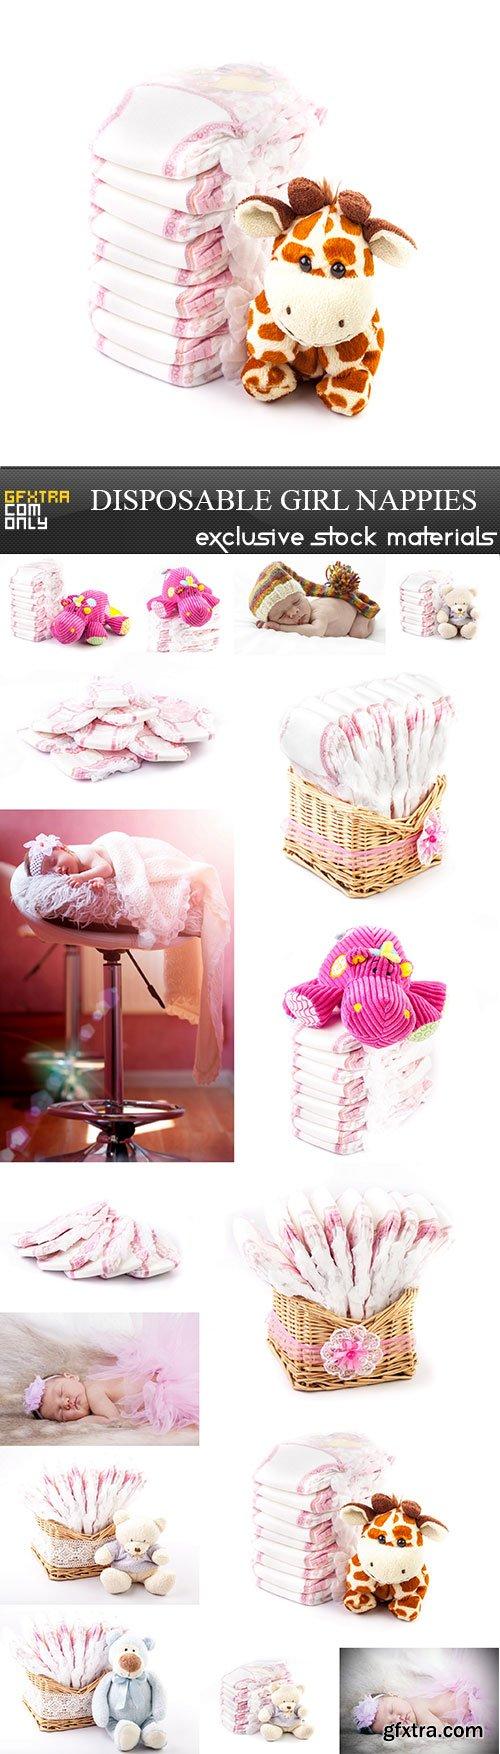 Disposable girl nappies, 16 x UHQ JPEG